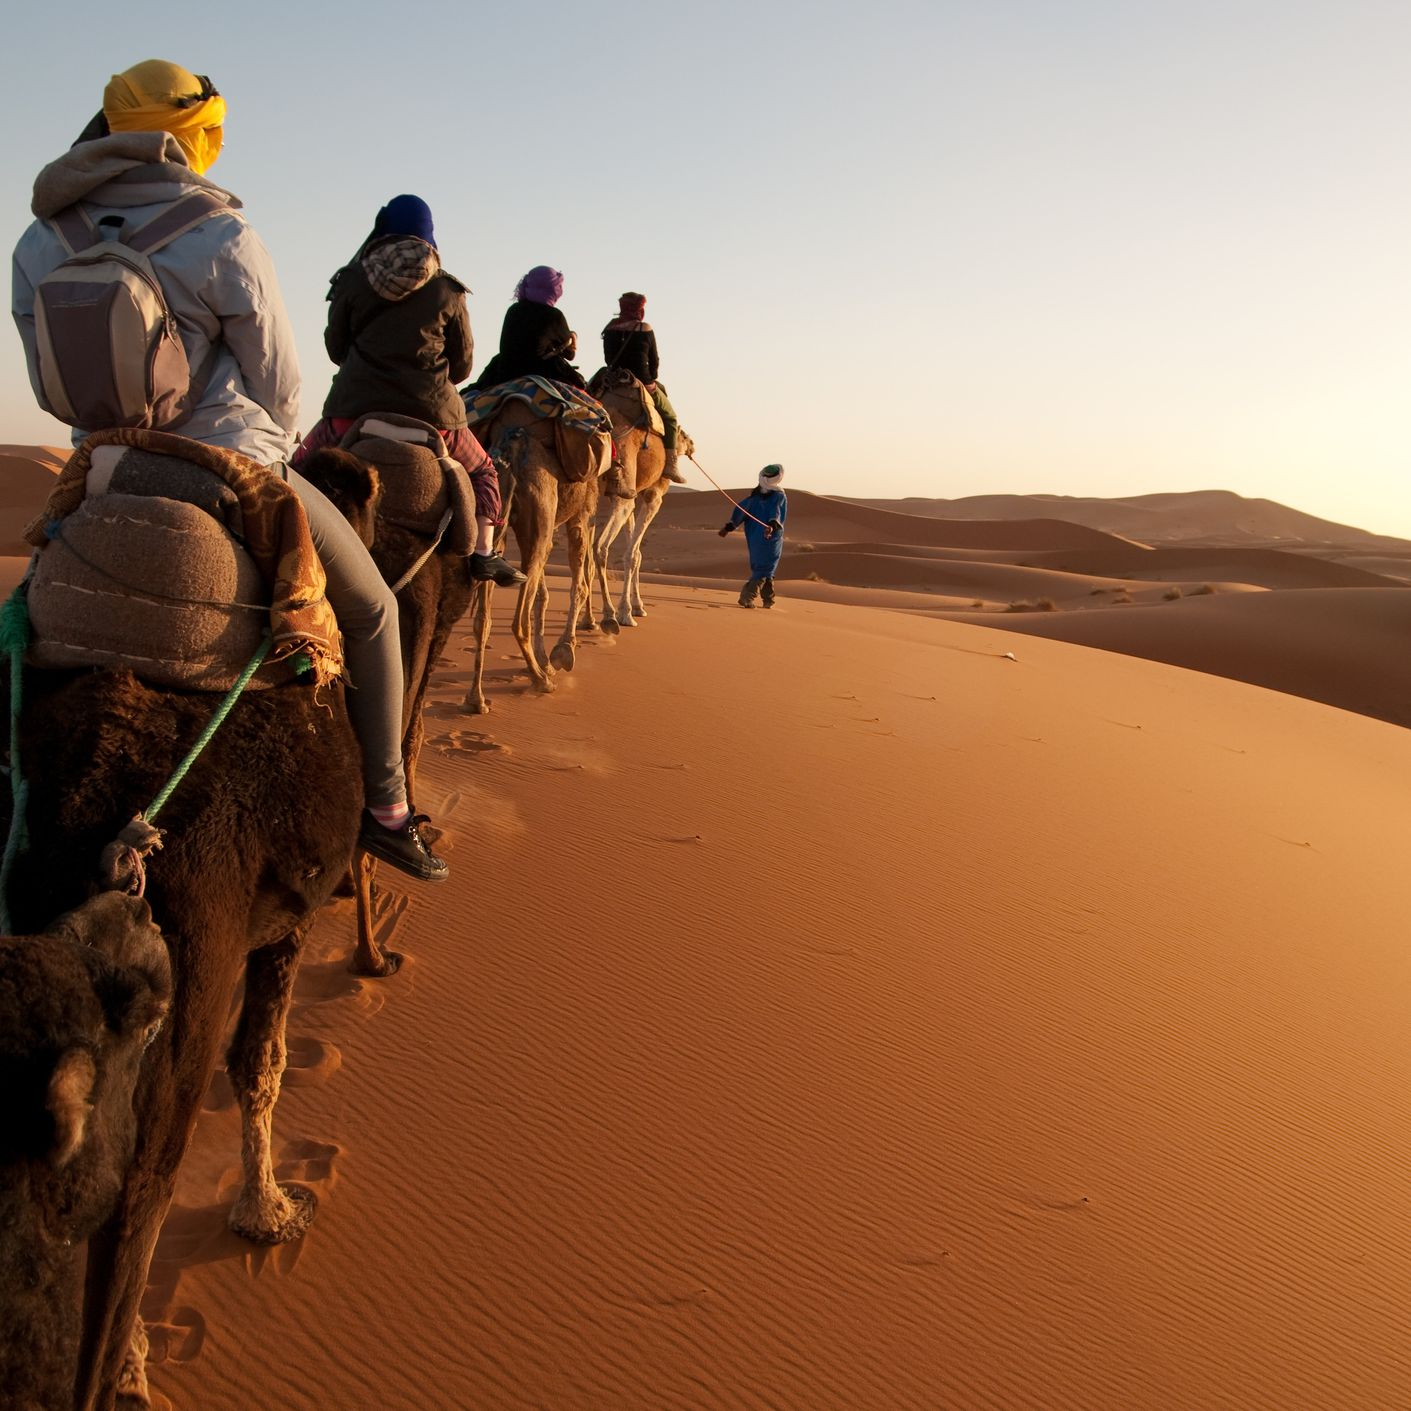 Morocco cover image